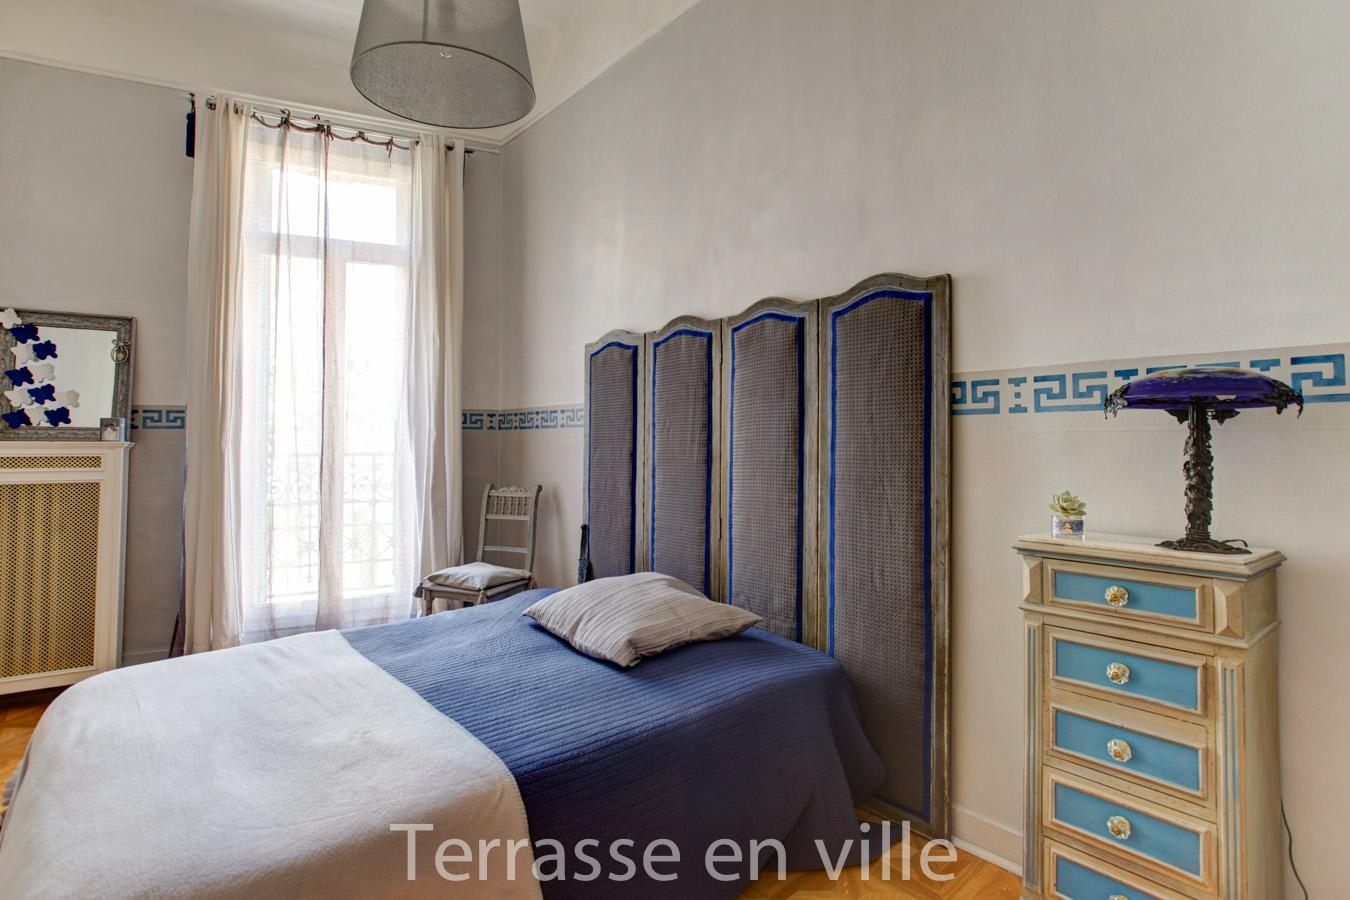 terrasse-6-1.jpg